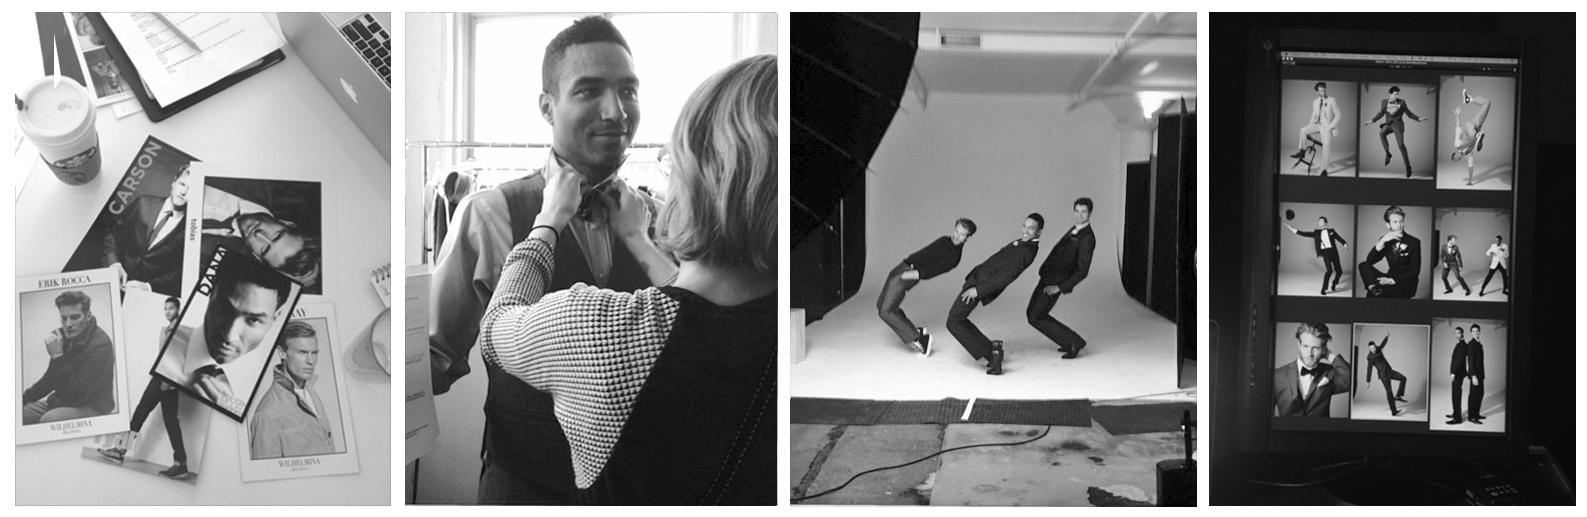 Photo Shoot Behind the Scenes | Editor's Edge | Photo Art Direction, Photo Art Director, Photo Art